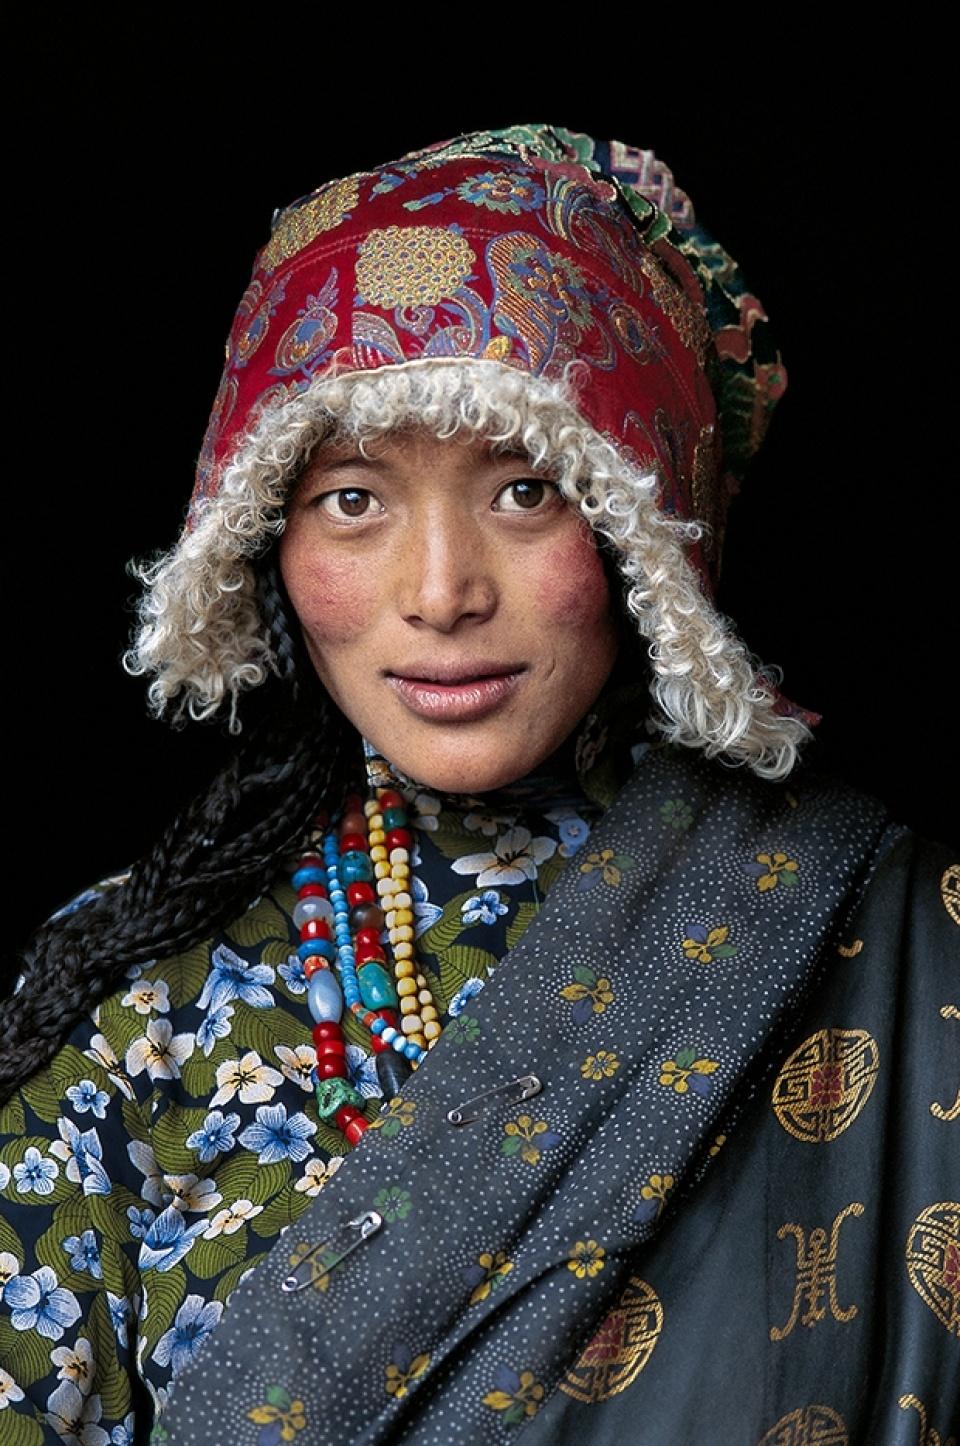 Steve McCurry. Tibetan Woman at a Temple. Amdo, Tibet, 2001.